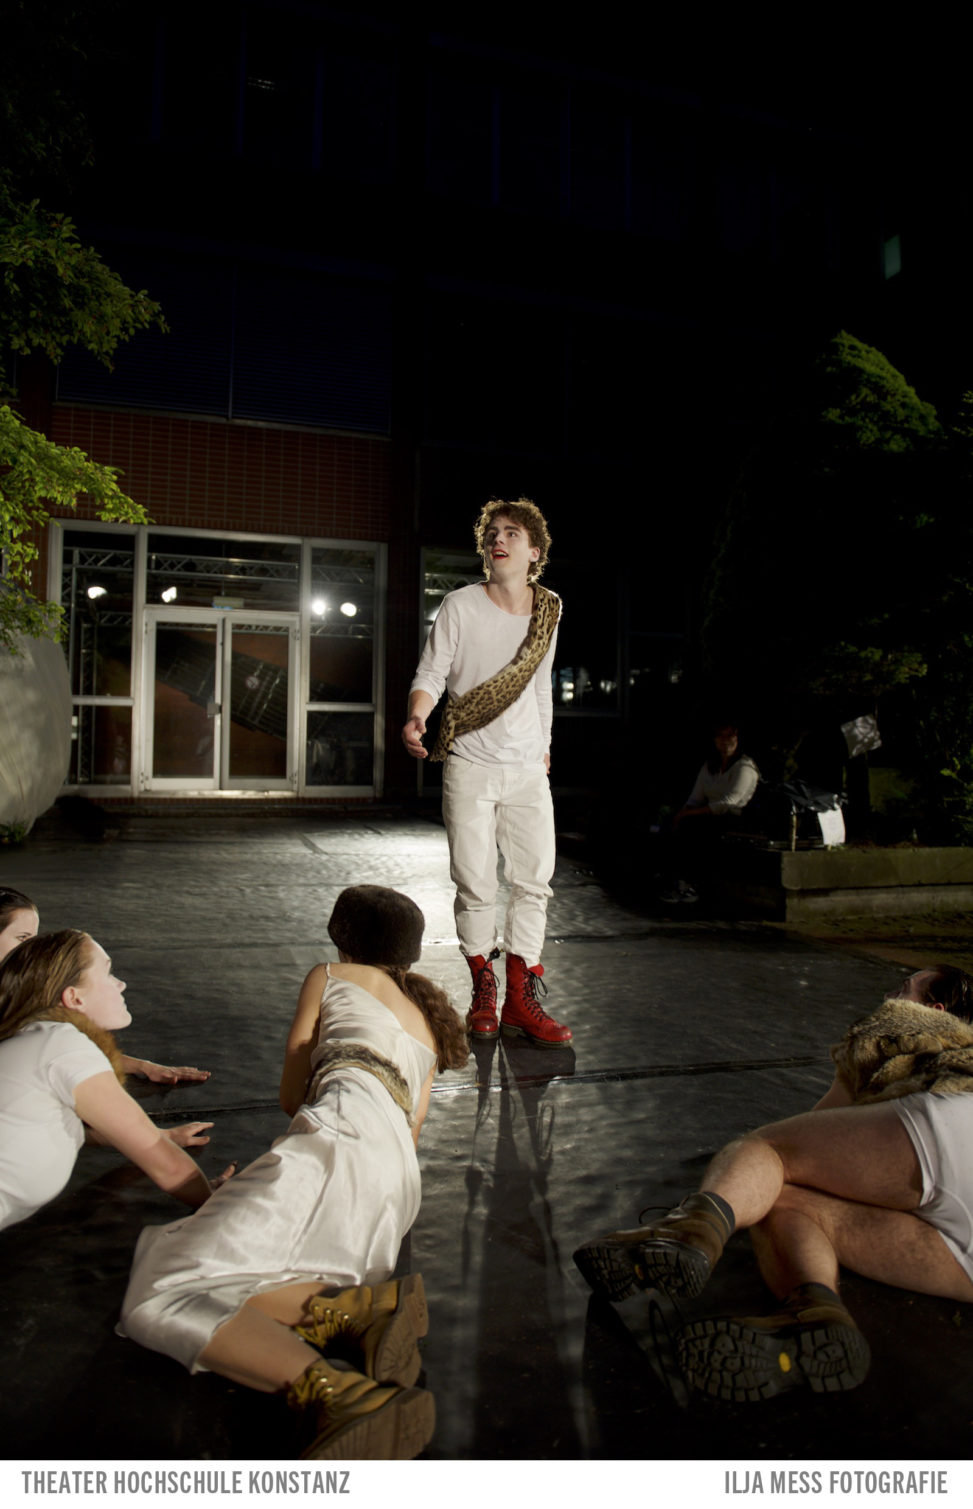 Geschichten aus dem Jenseits. Theater Hochschule Konstanz